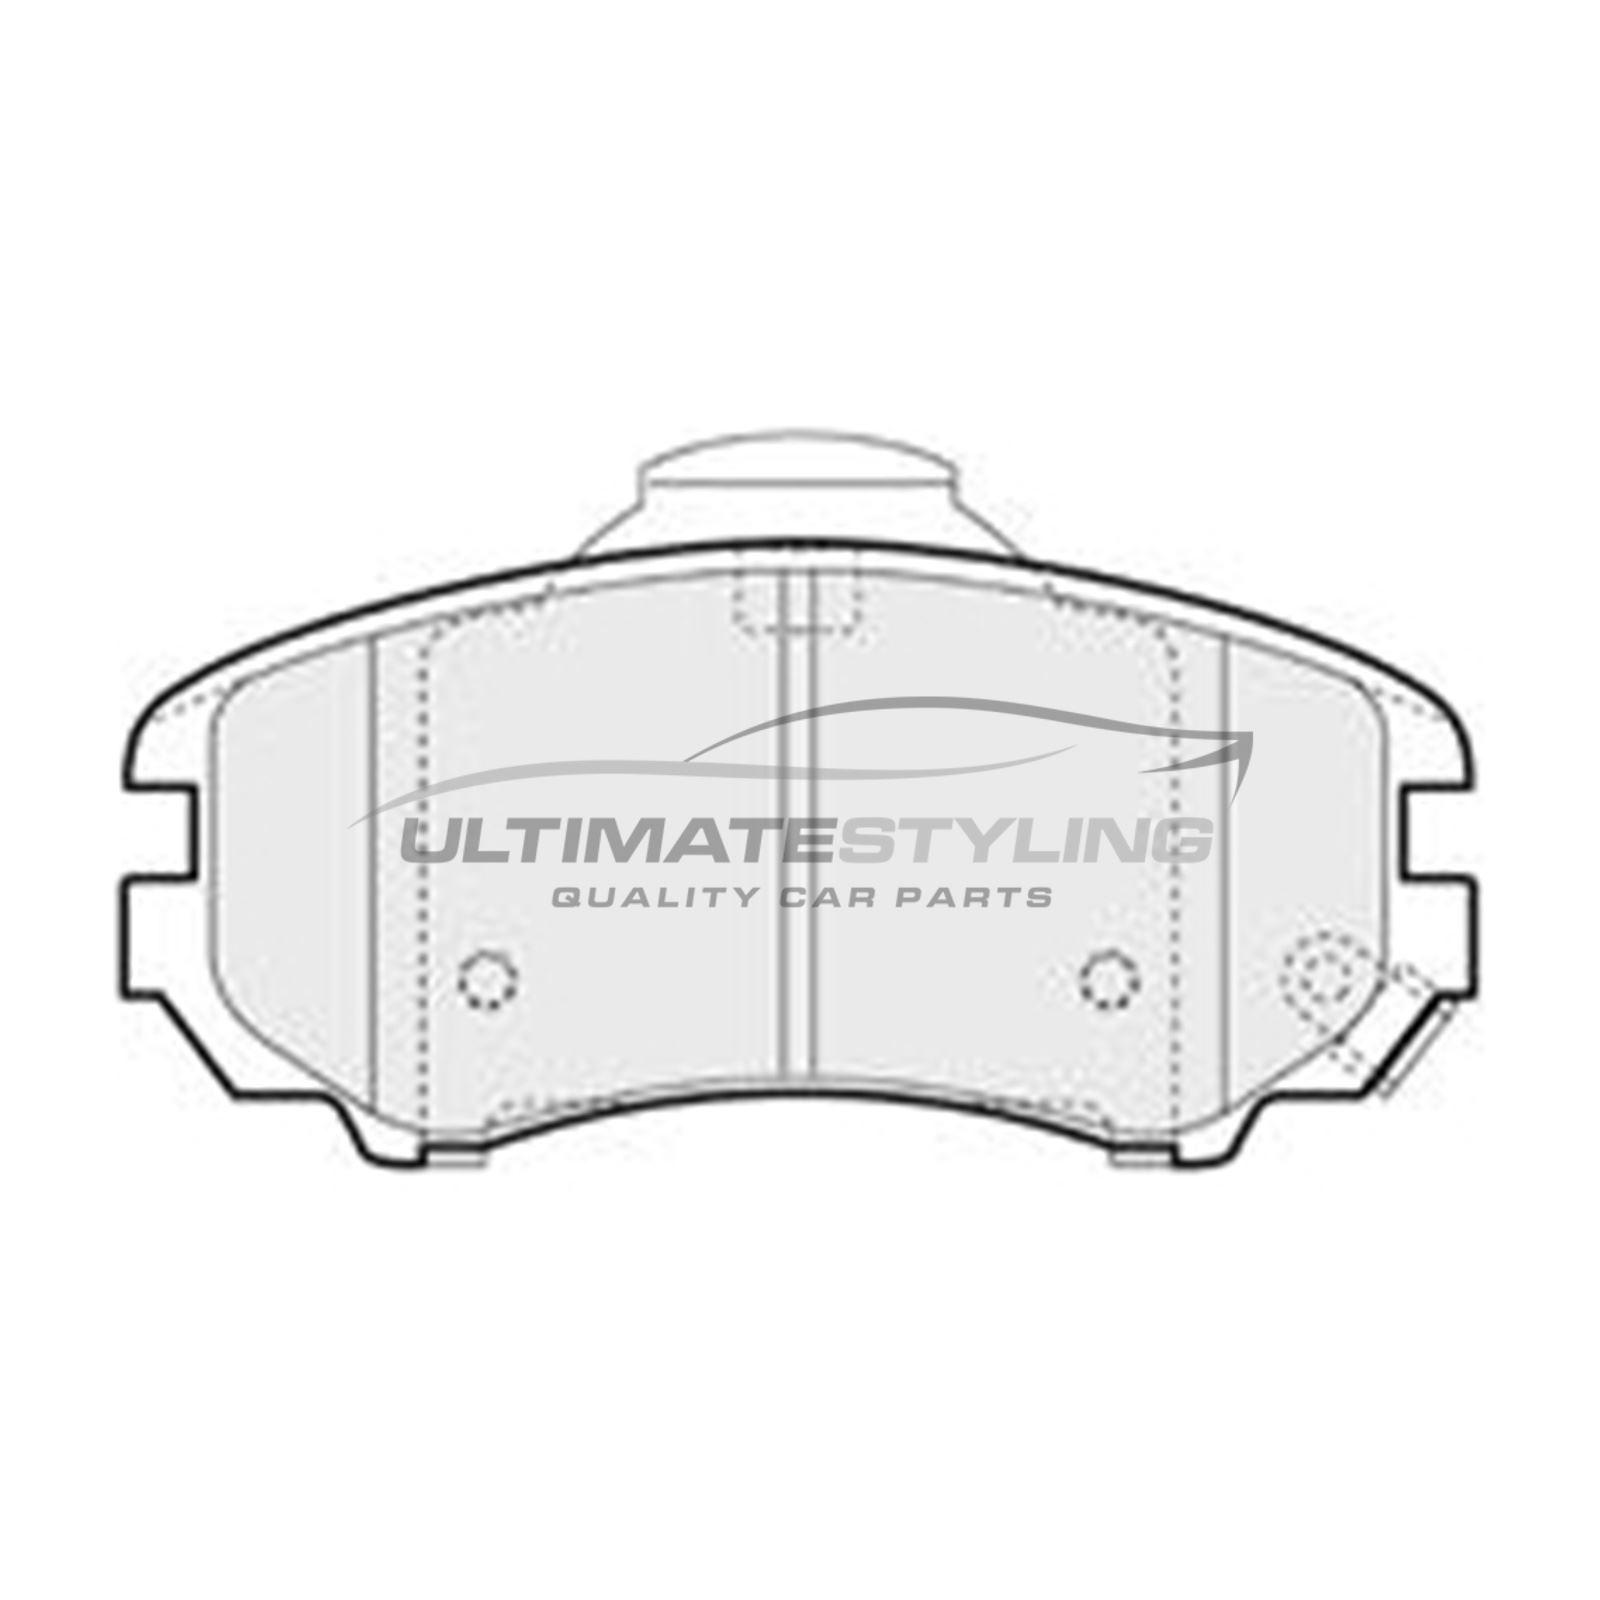 FRONT BRAKE PADS SET FIT HYUNDAI TUCSON 2004-2010 2.0 2.7 CRDI AWD